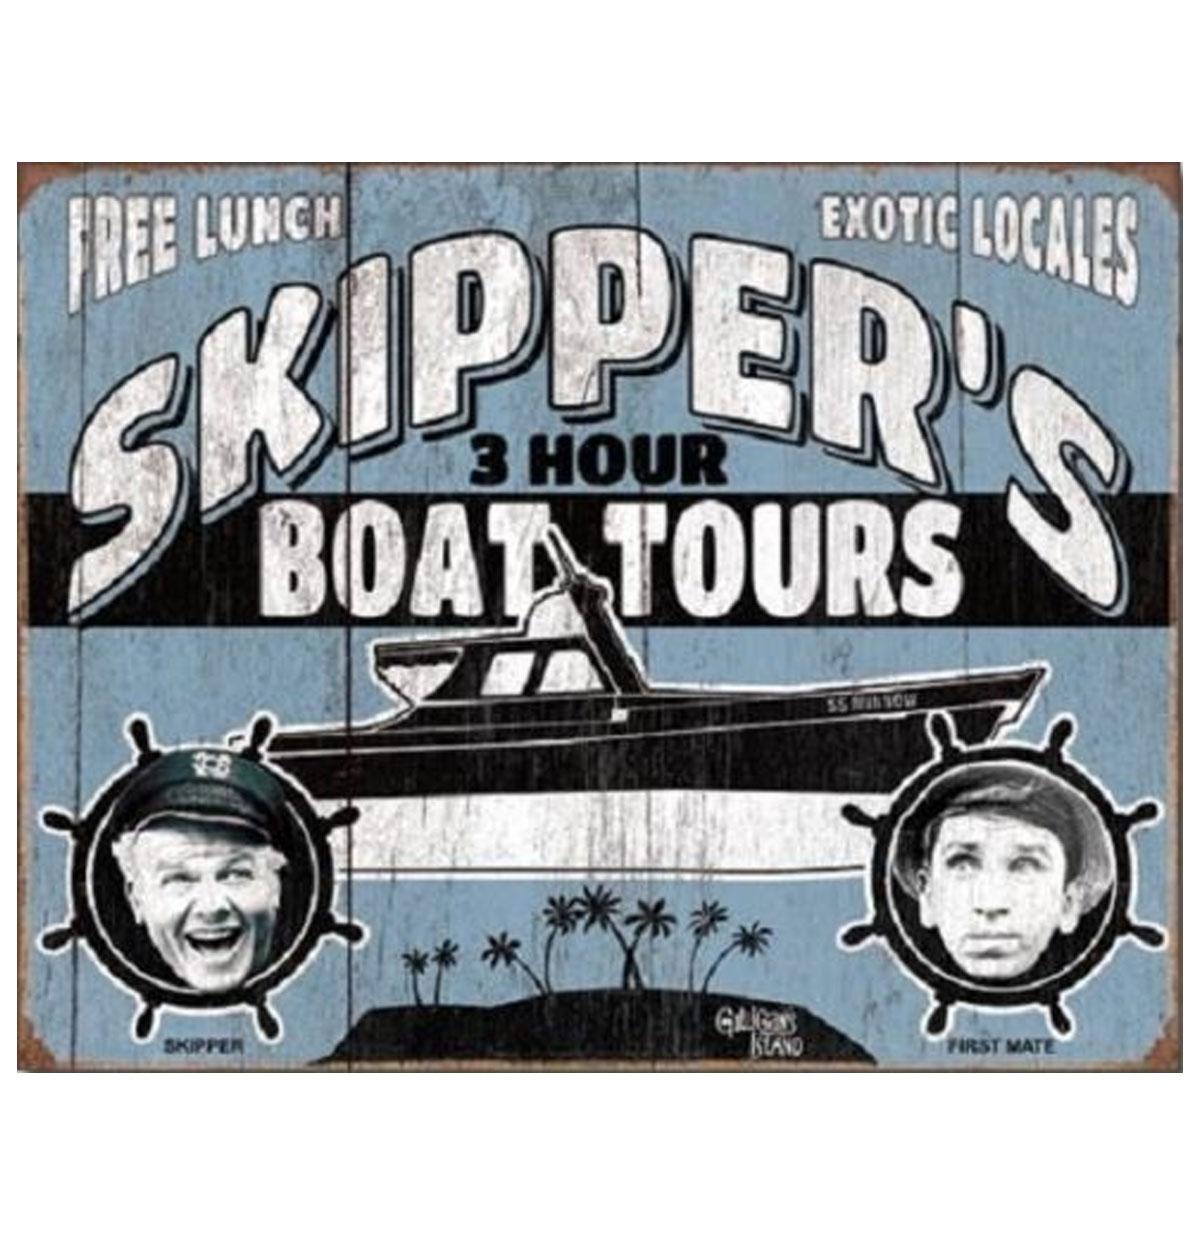 Skipper 3 Hours Boat Tours Metalen Poster